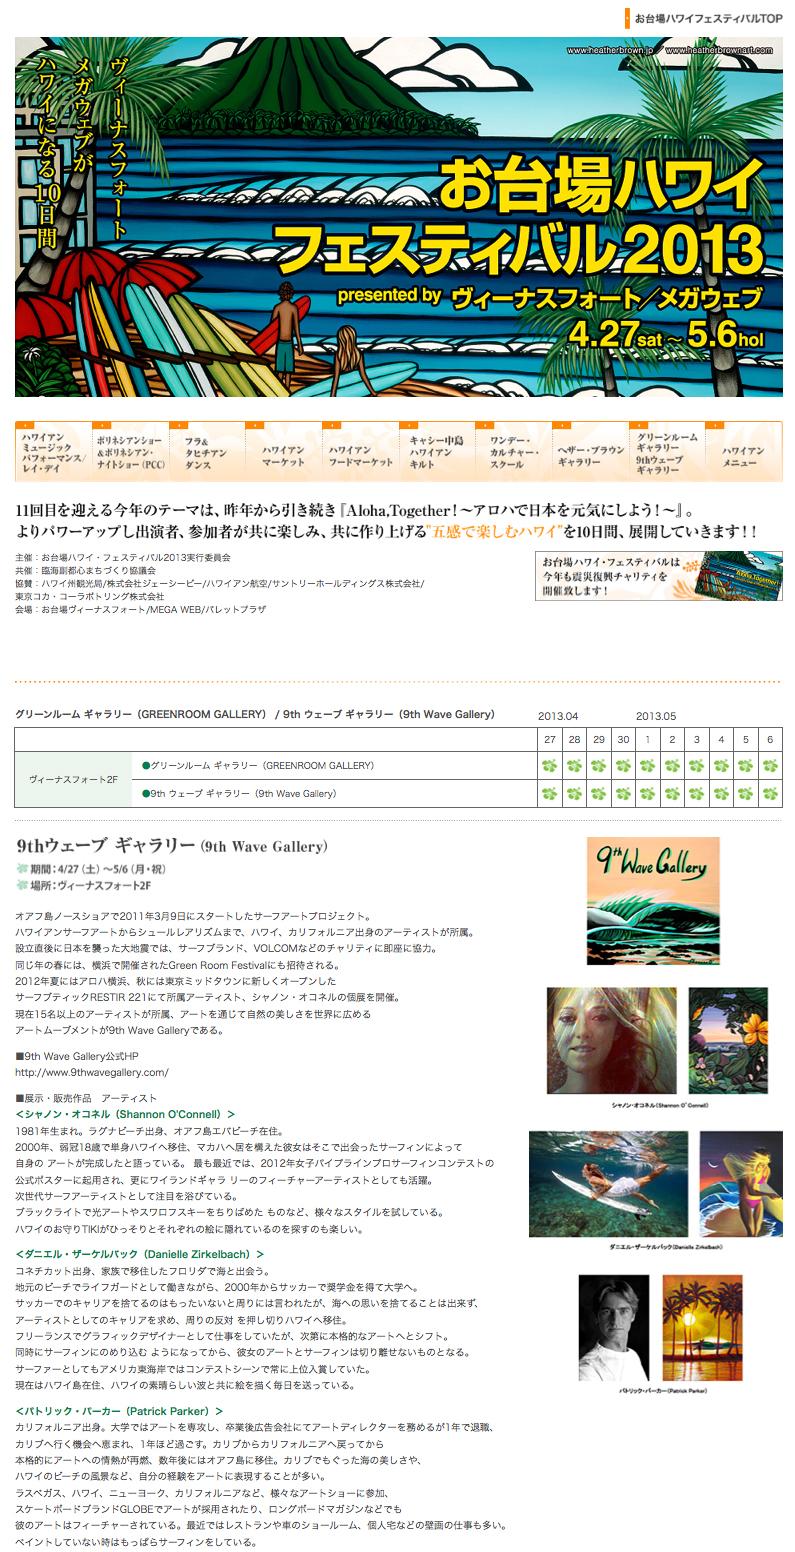 2013-04-17-9th-wave-gallery-odaiba-fest-www.venusfort.co.jp-1.jpg